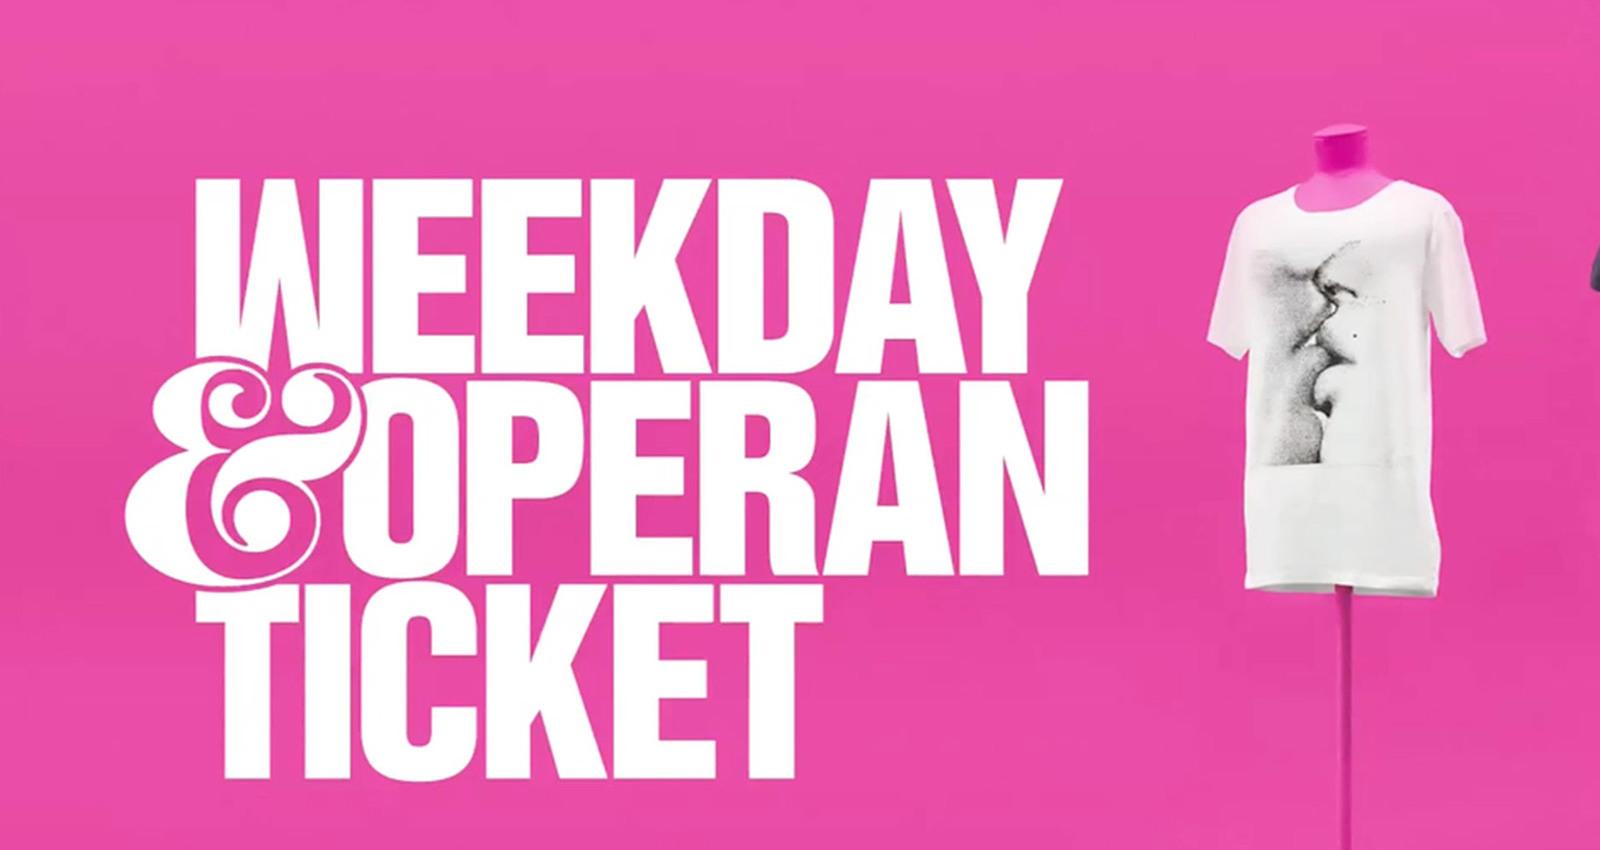 Weekday Tickets